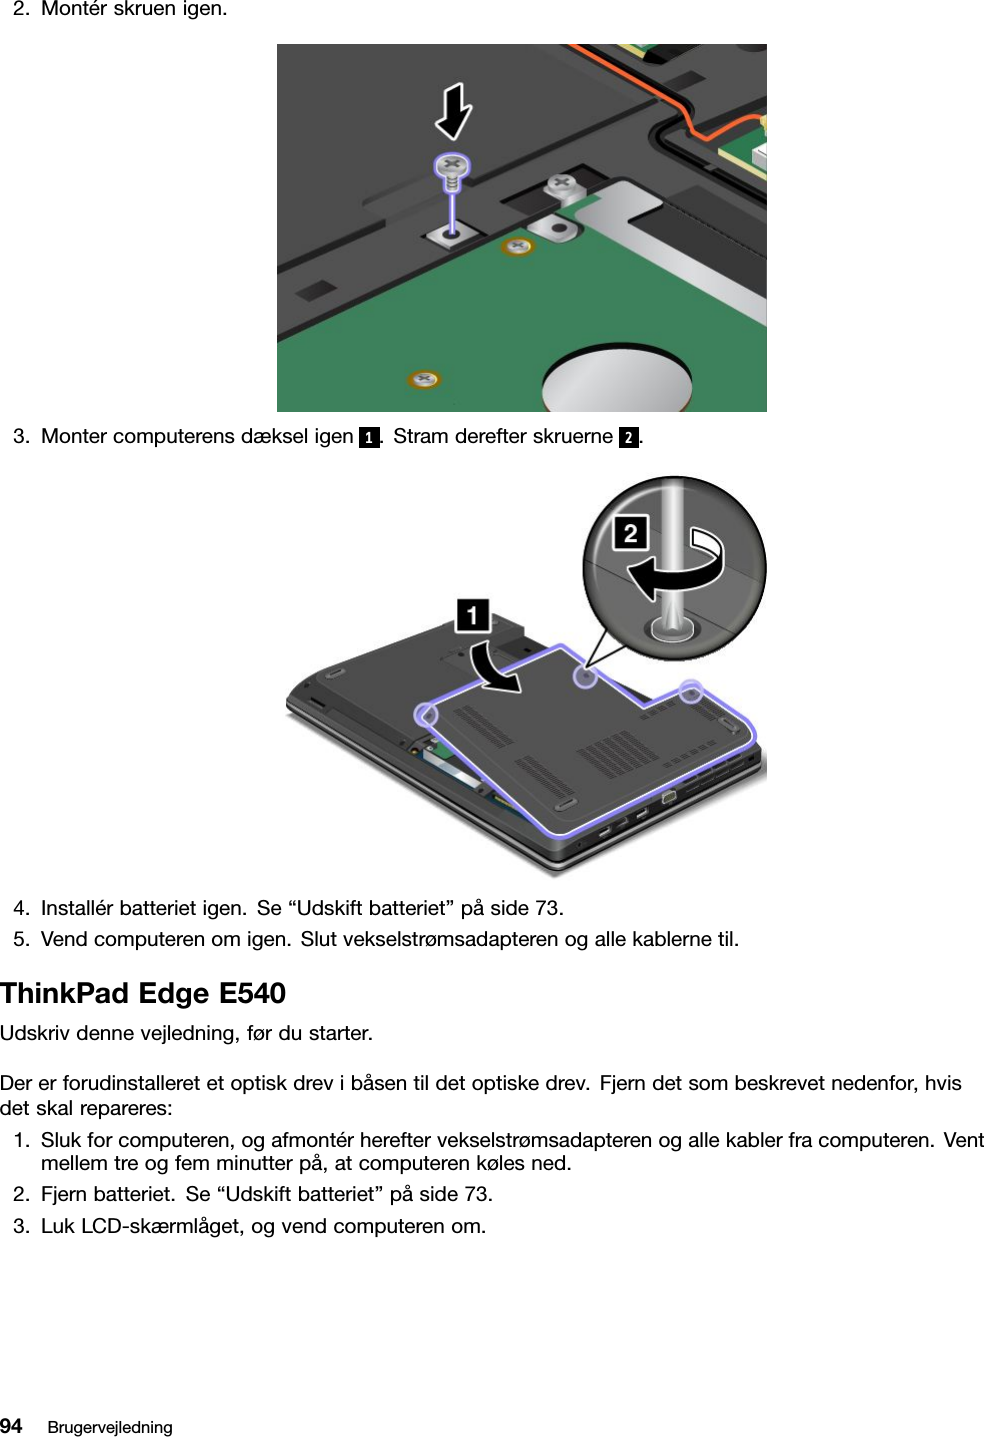 Lenovo E440 E540 Ug Da User Manual (Danish) Guide Think Pad Edge